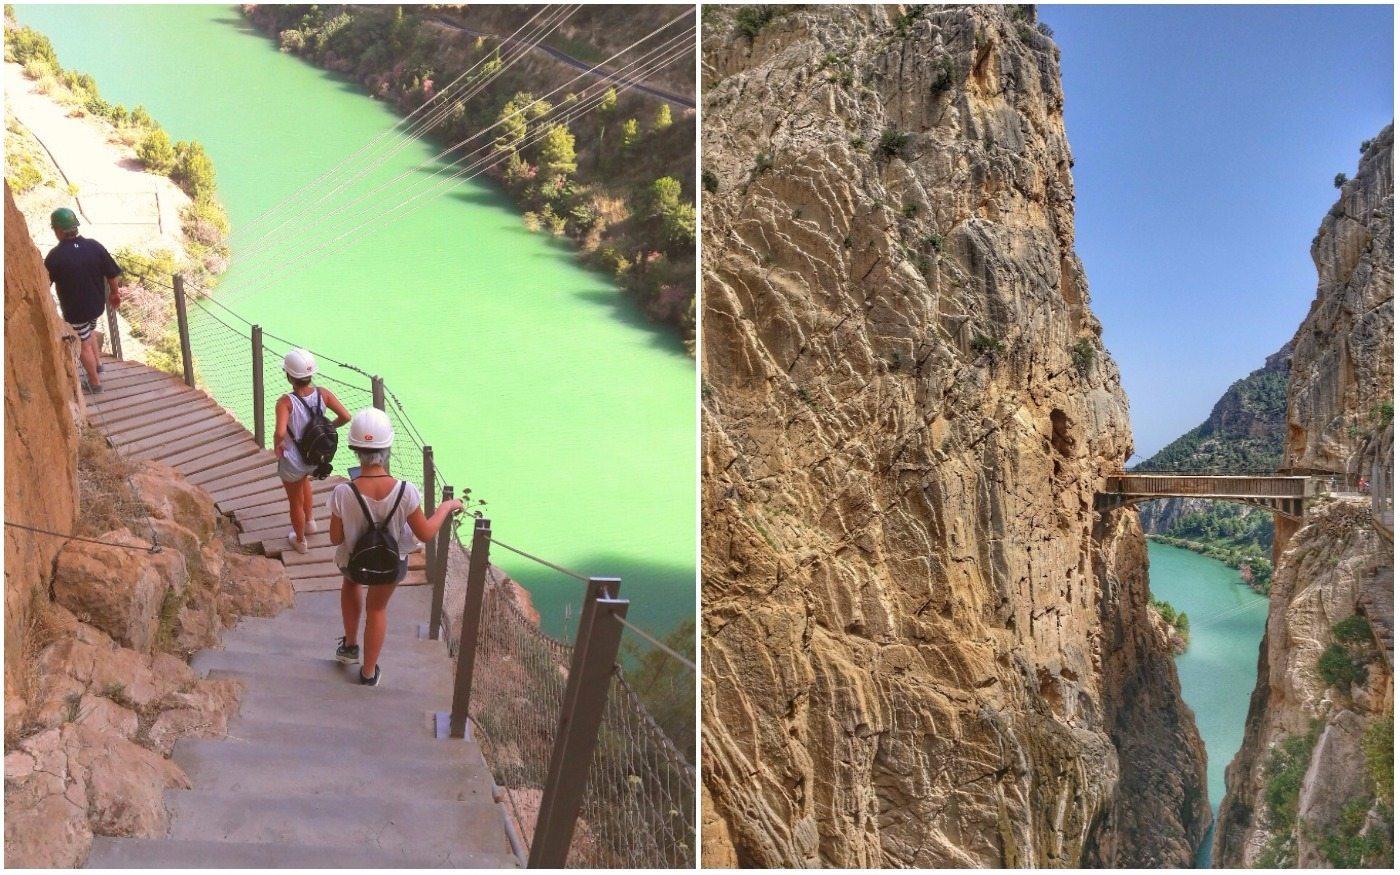 Montes de Malaga National Park - Things to Do in Malaga